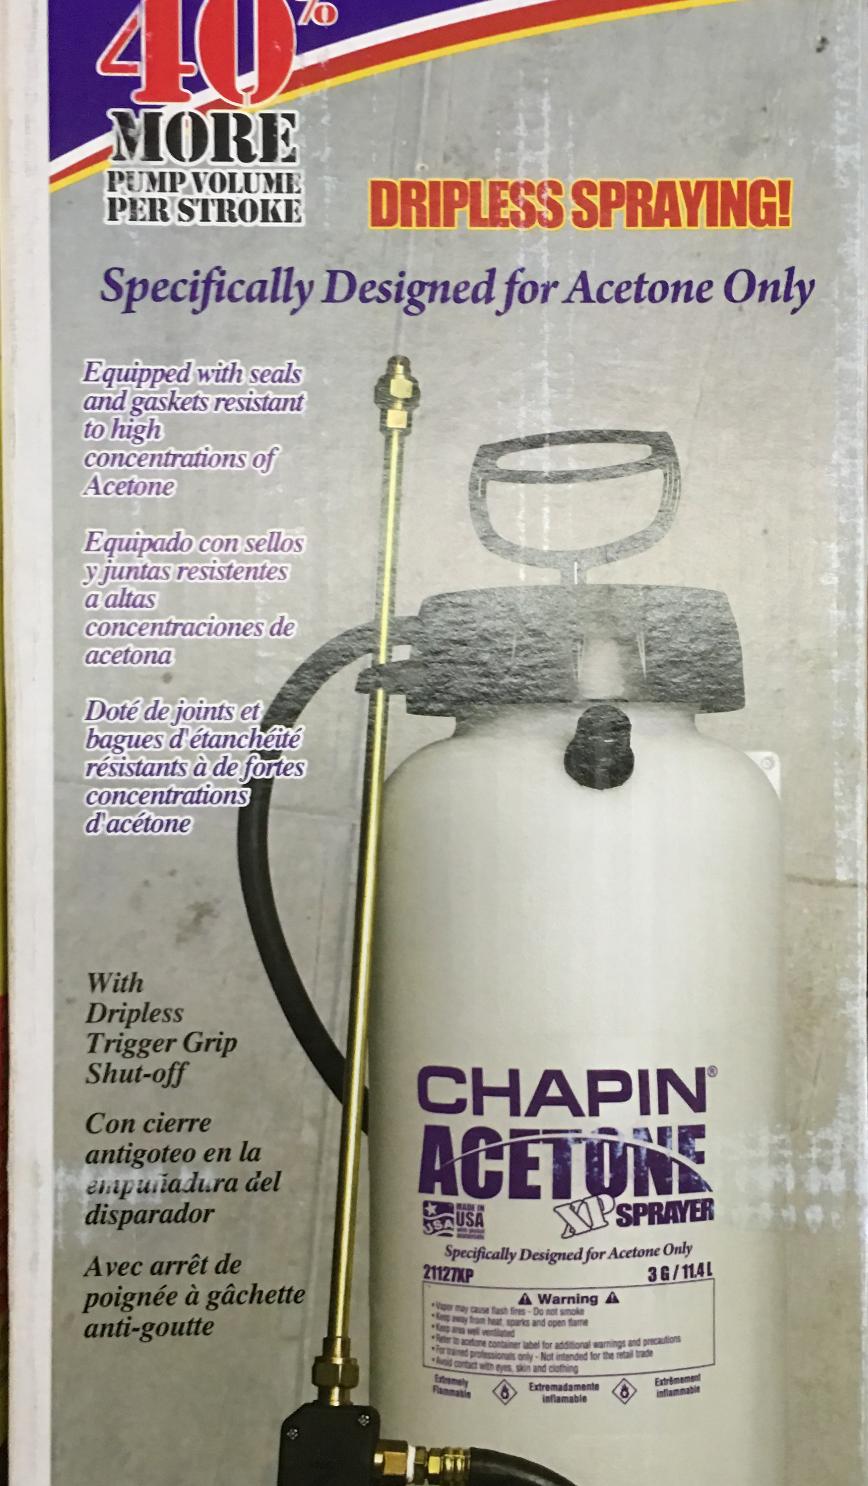 Chapin Acetone Sprayer